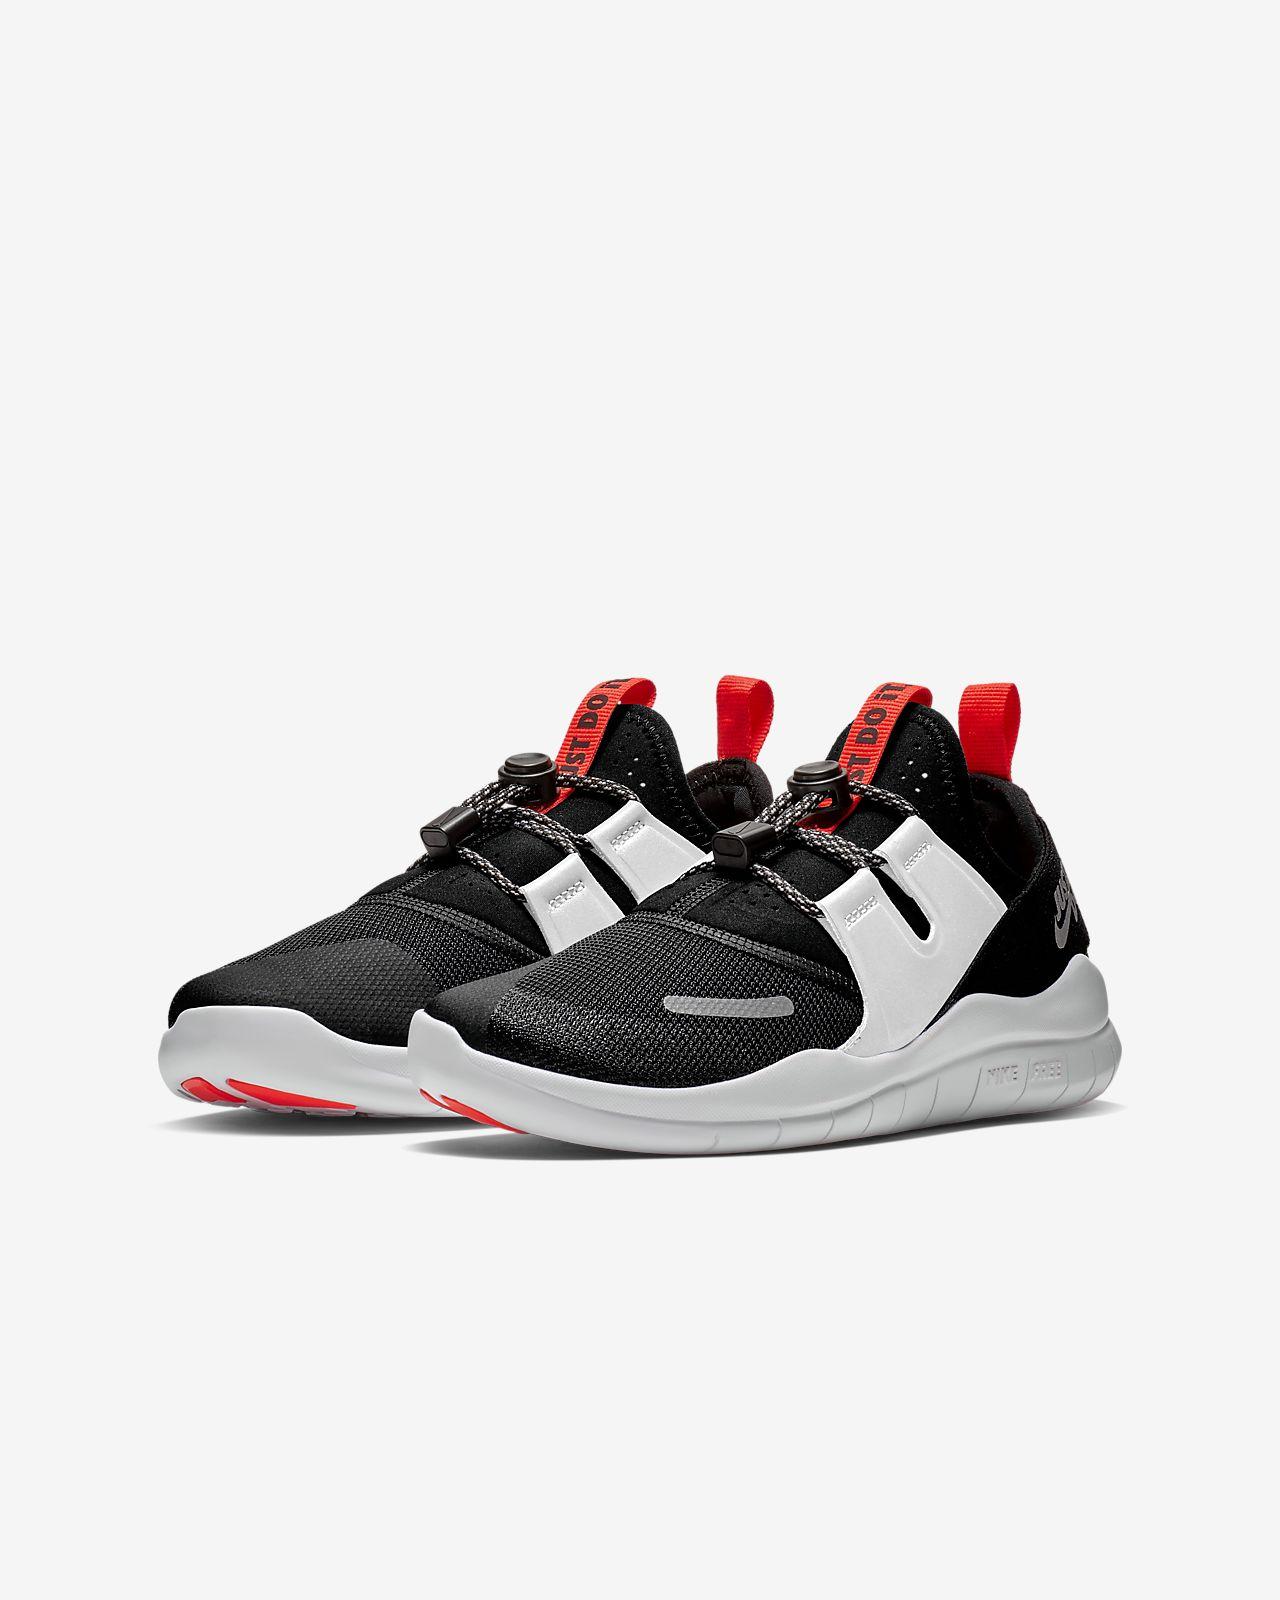 268f6b851d4 Nike Free RN Commuter 2018 JDI Big Kids  Running Shoe. Women s ...